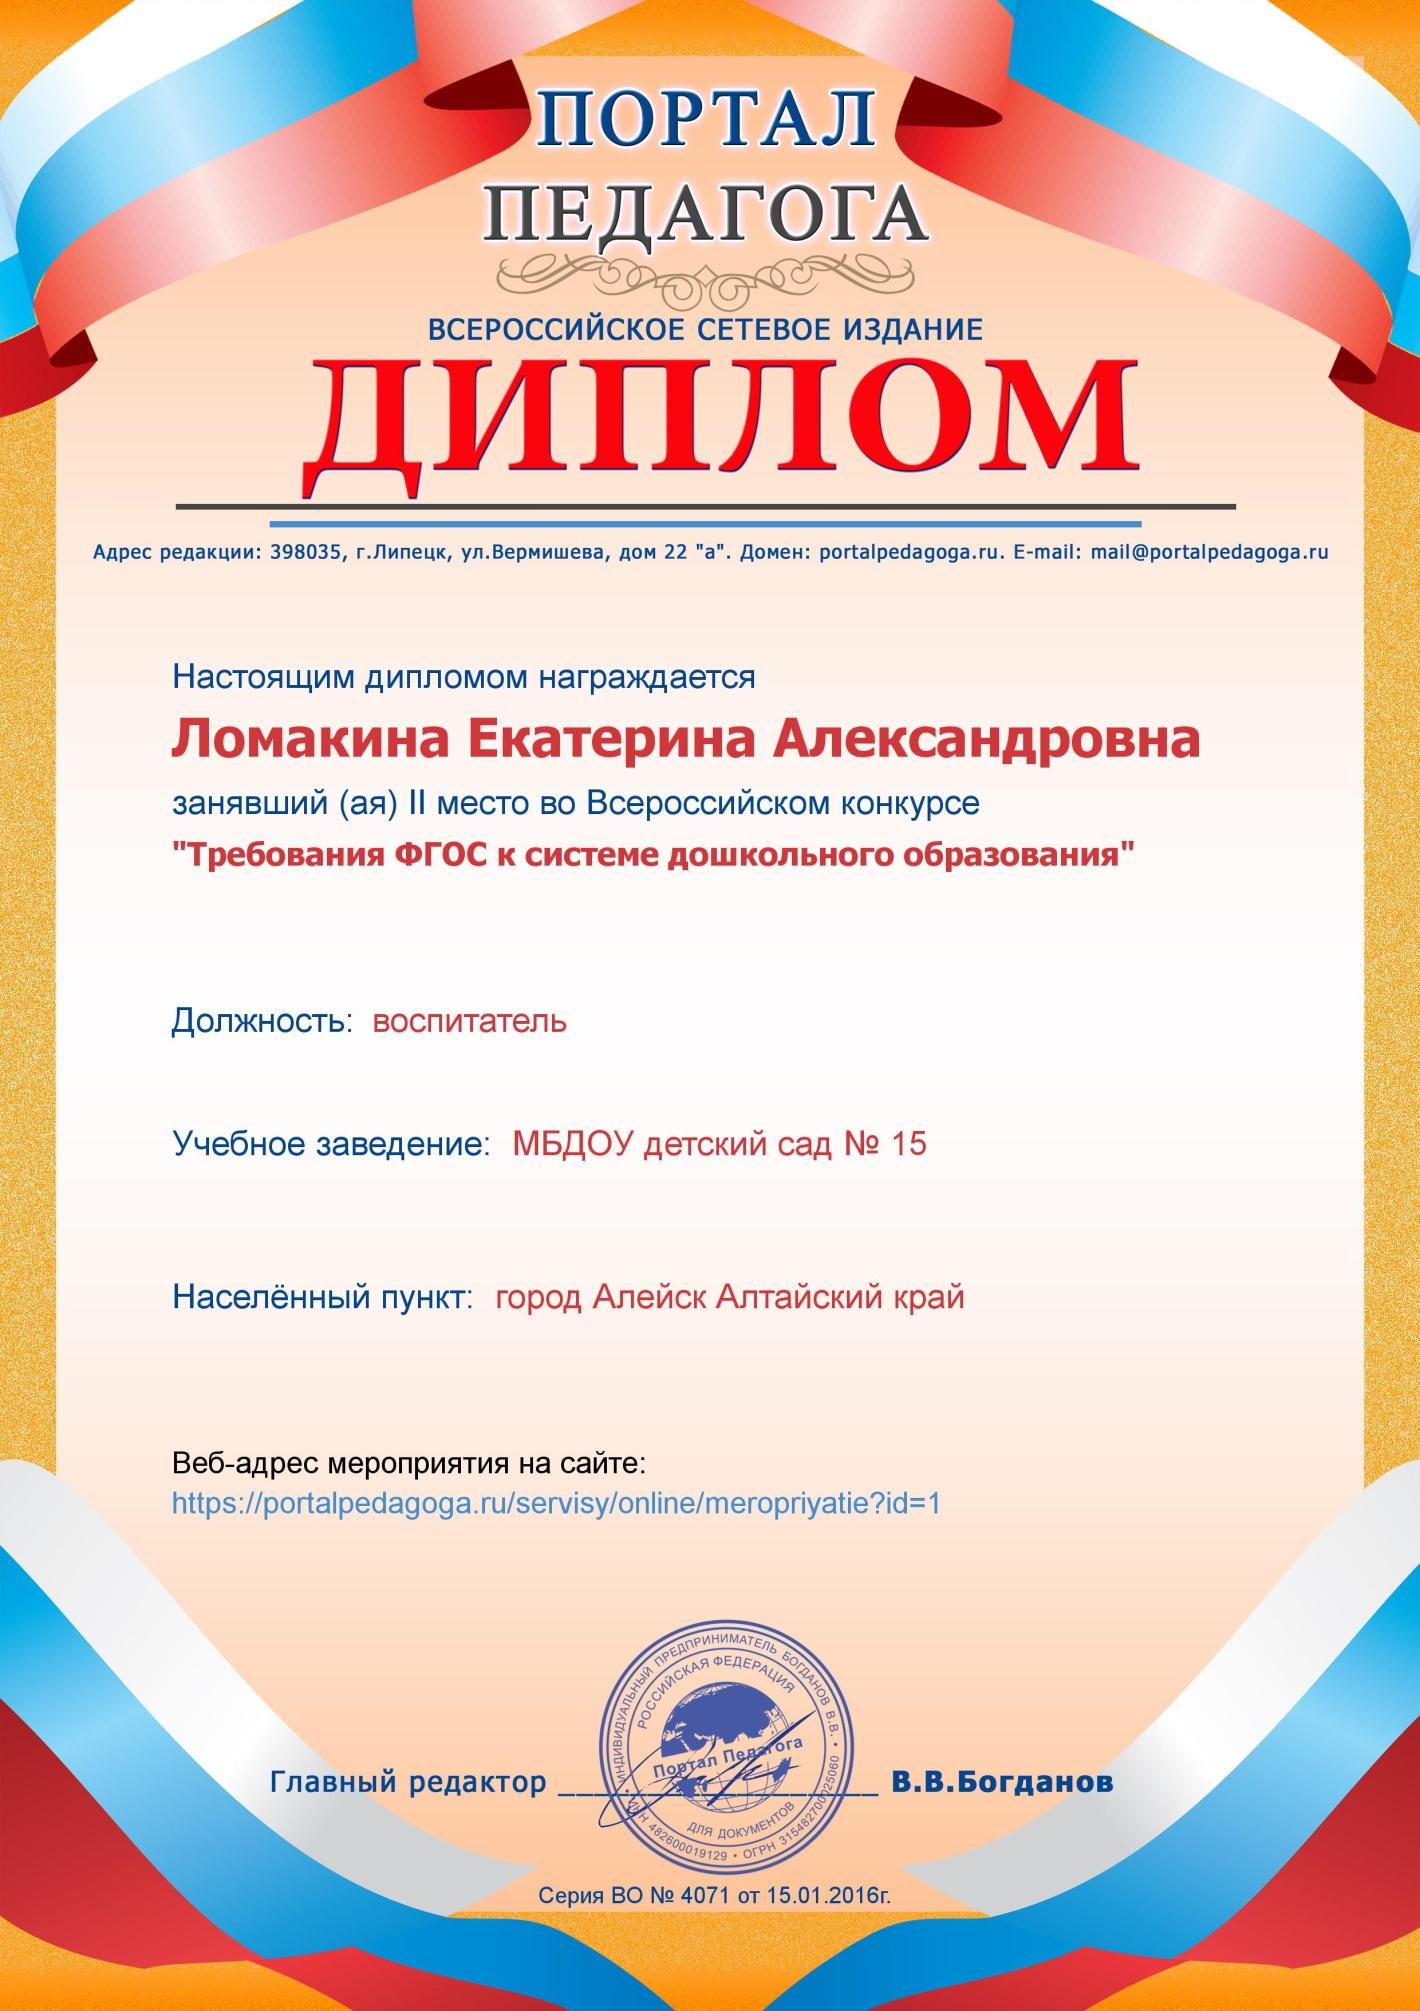 C:\Documents and Settings\Admin\Рабочий стол\diplom (1).jpg